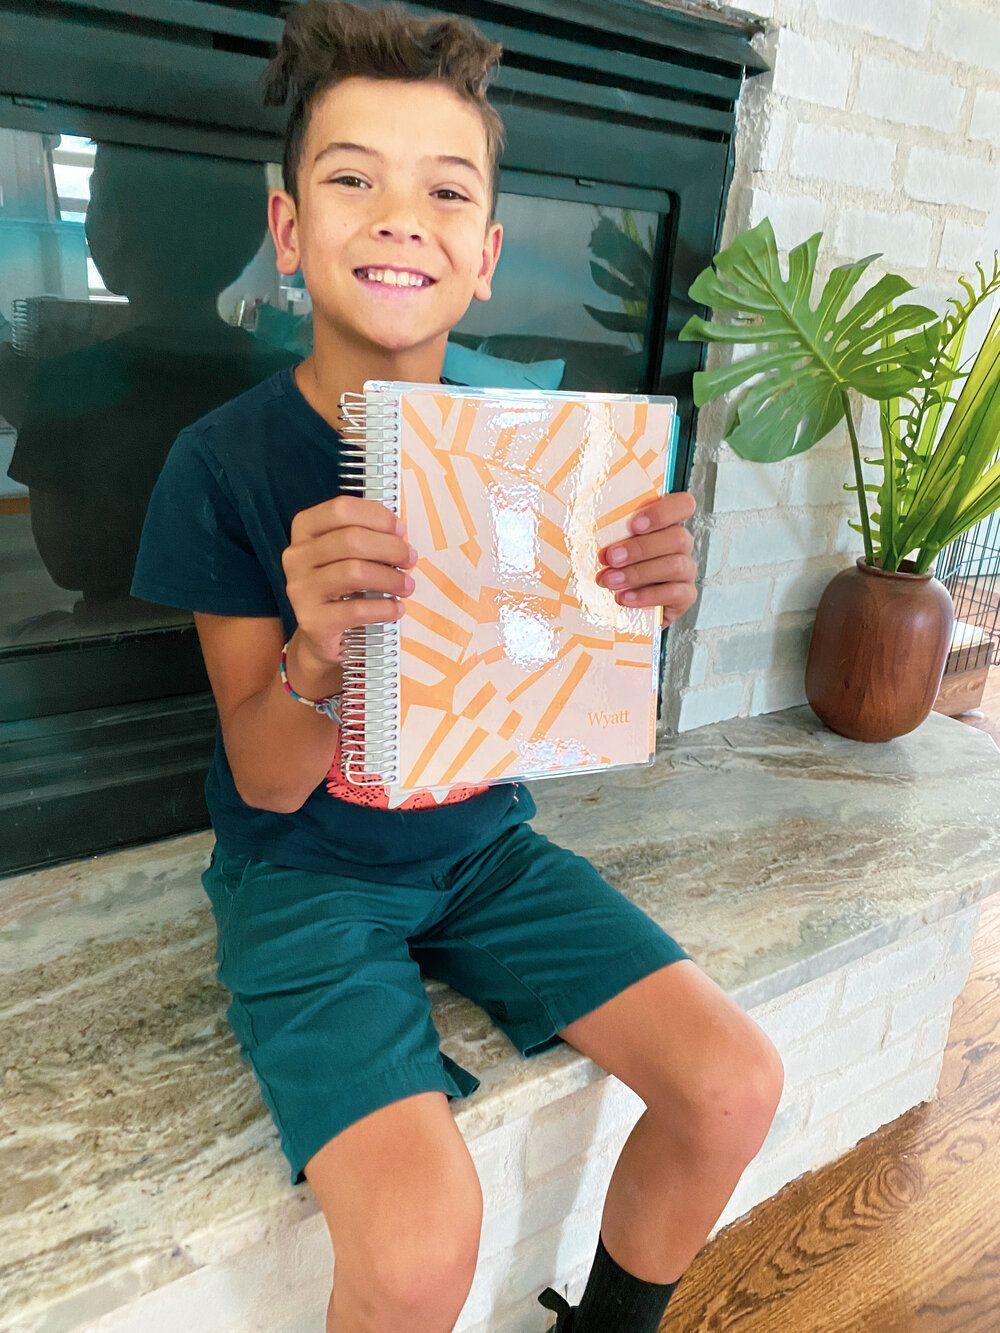 Wyatt's school planner